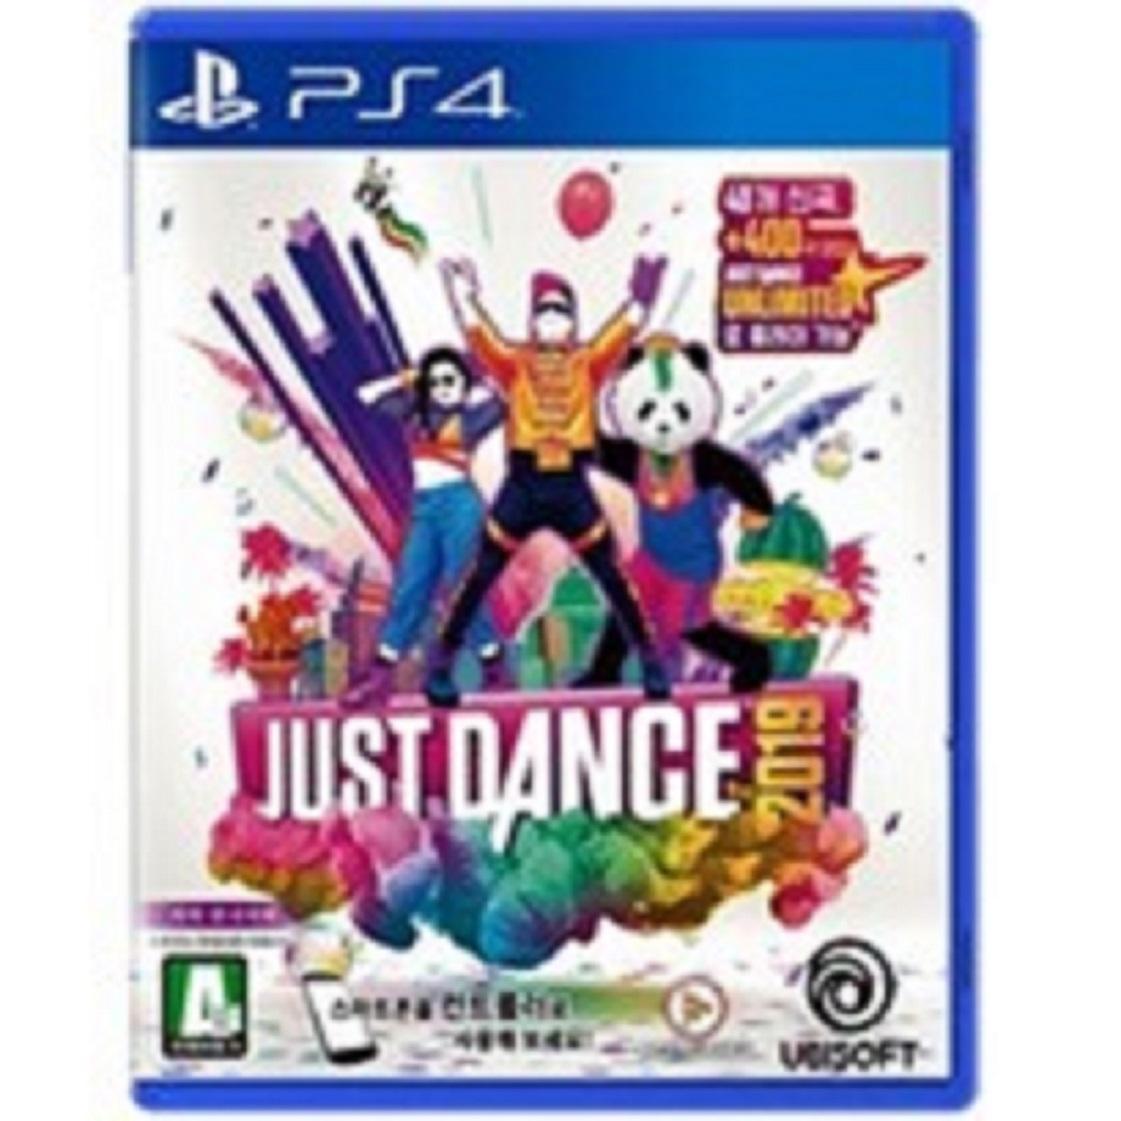 PS4 저스트댄스 2019 (PS4) 한글판 새제품